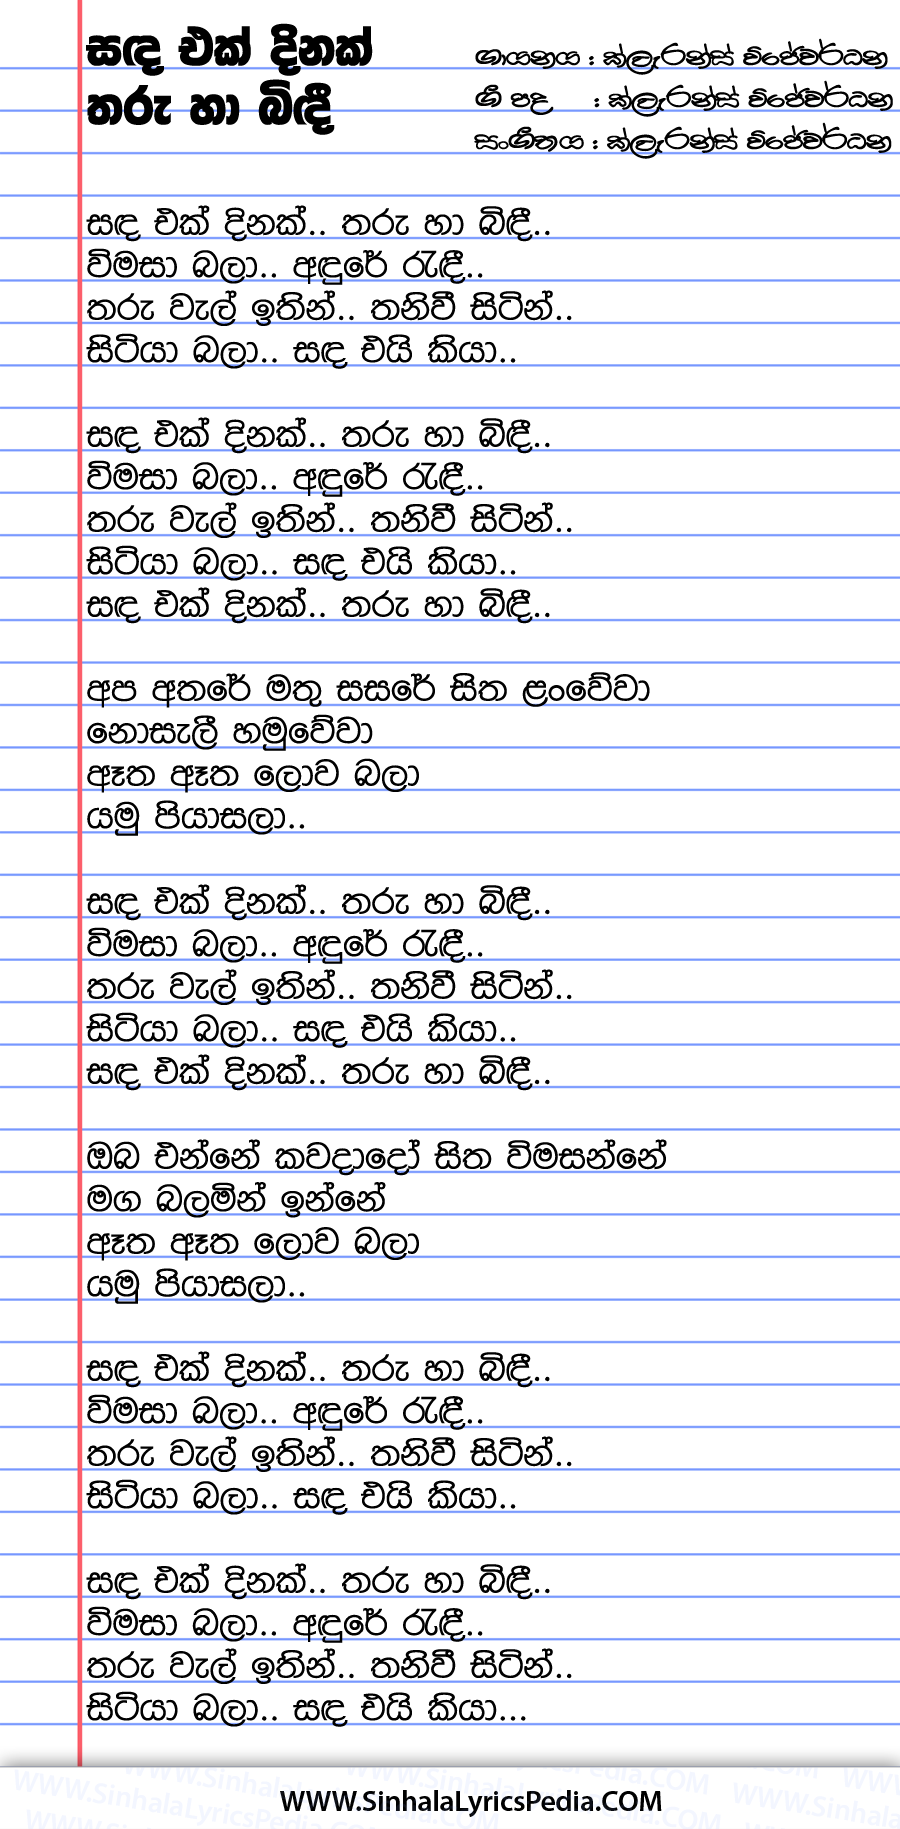 Sanda Ek Dinak Tharu Ha Bindi Song Lyrics